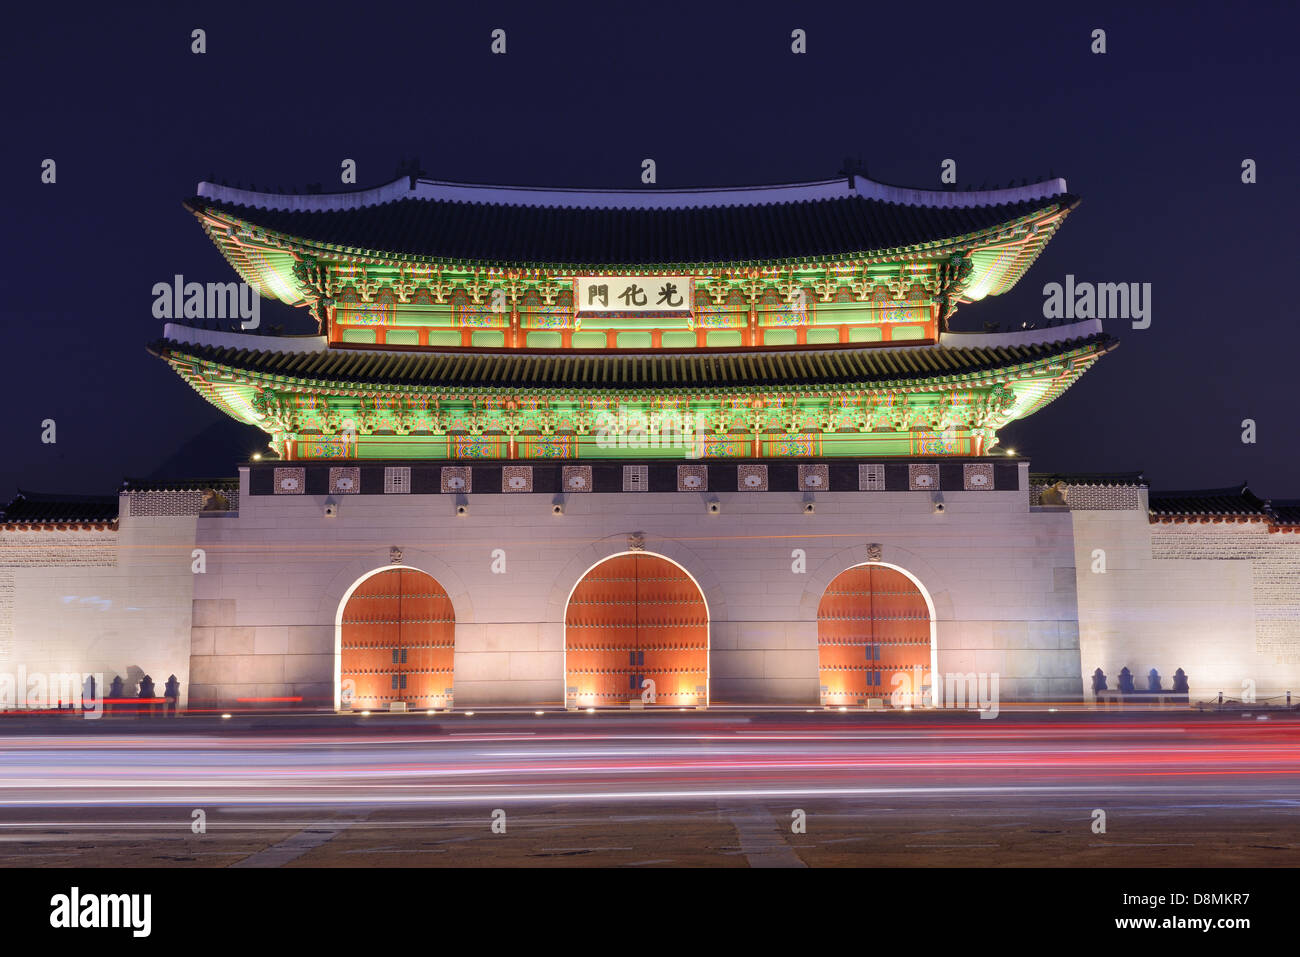 Gwanghwamun-Tor im Gyeongbokgung Palace in Seoul, Südkorea. Stockbild